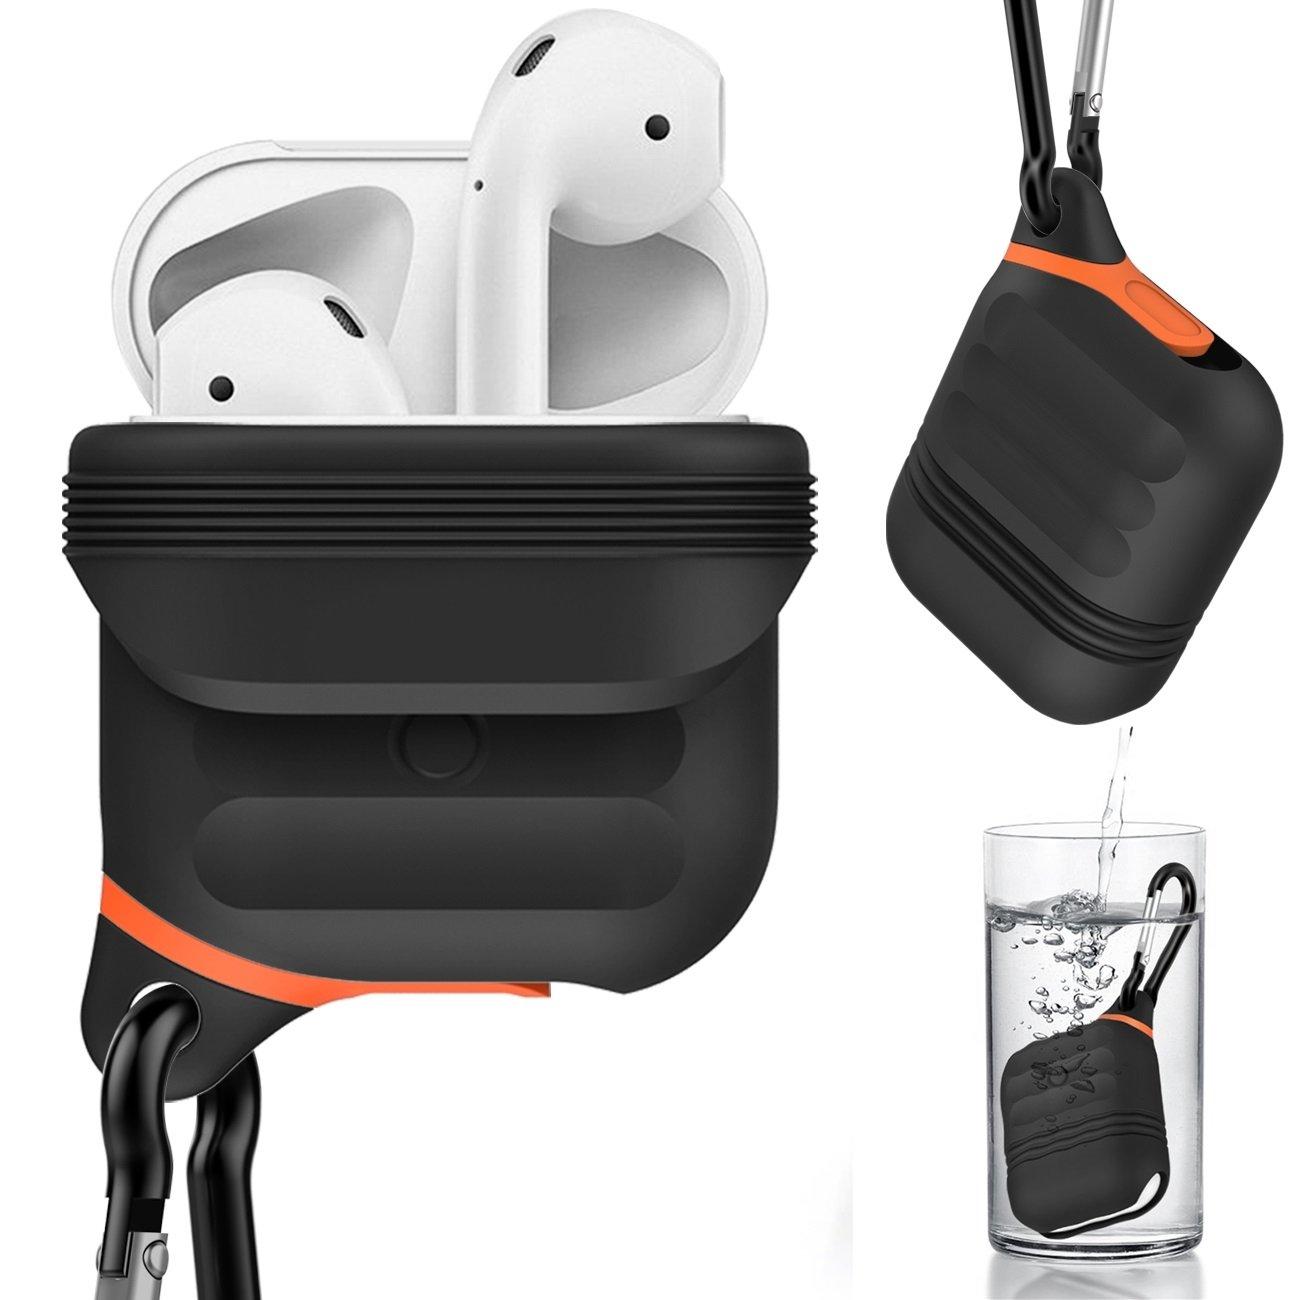 Greatfine para Apple Airpods Bolsa de Funda Blanda de Silicona Prueba de Agua Caso Cubierta Suave de TPU Ultra Delgada Protector para Airpods Headphones ...